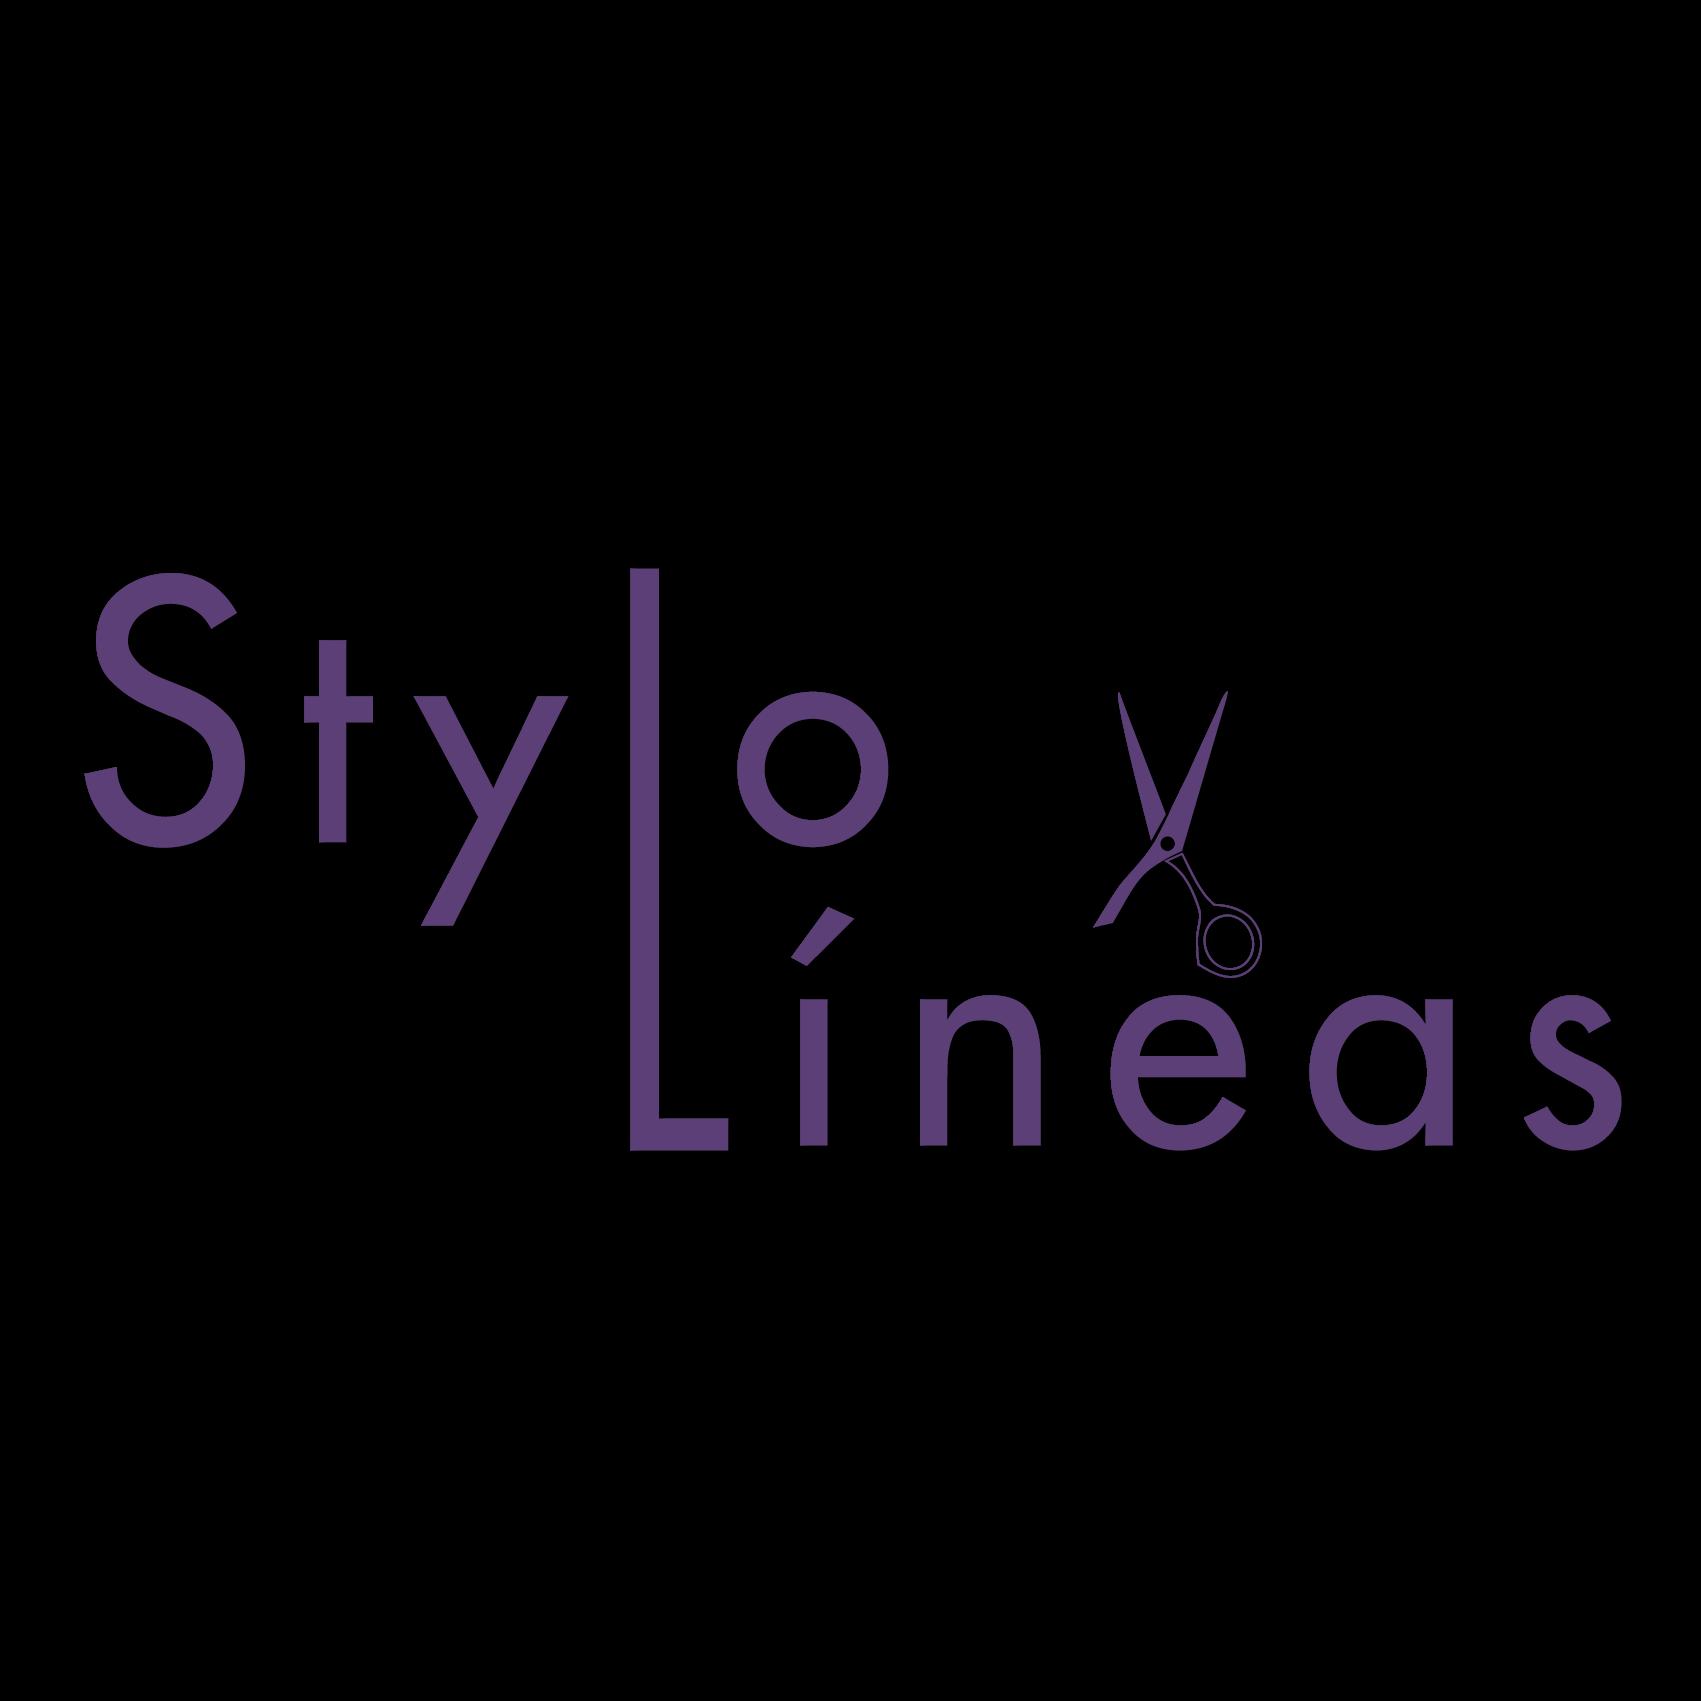 Stylo y Líneas